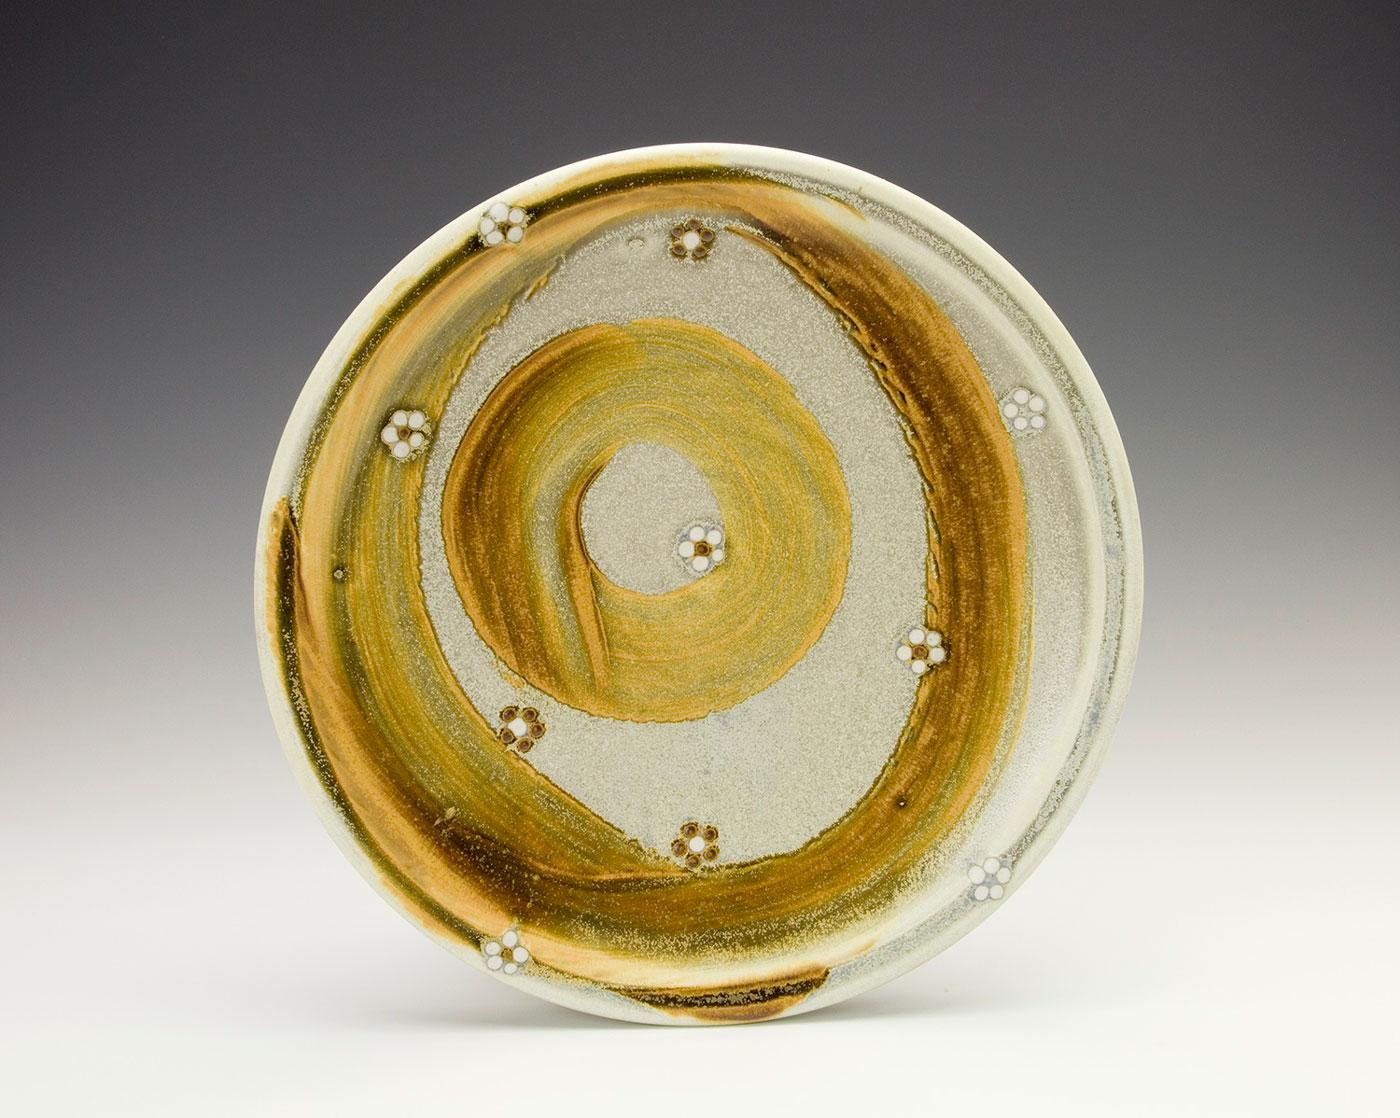 Abstract-Bronze-Moka-circle-plate-Samantha-Henneke-Seagrove-North-Carolina.jpg